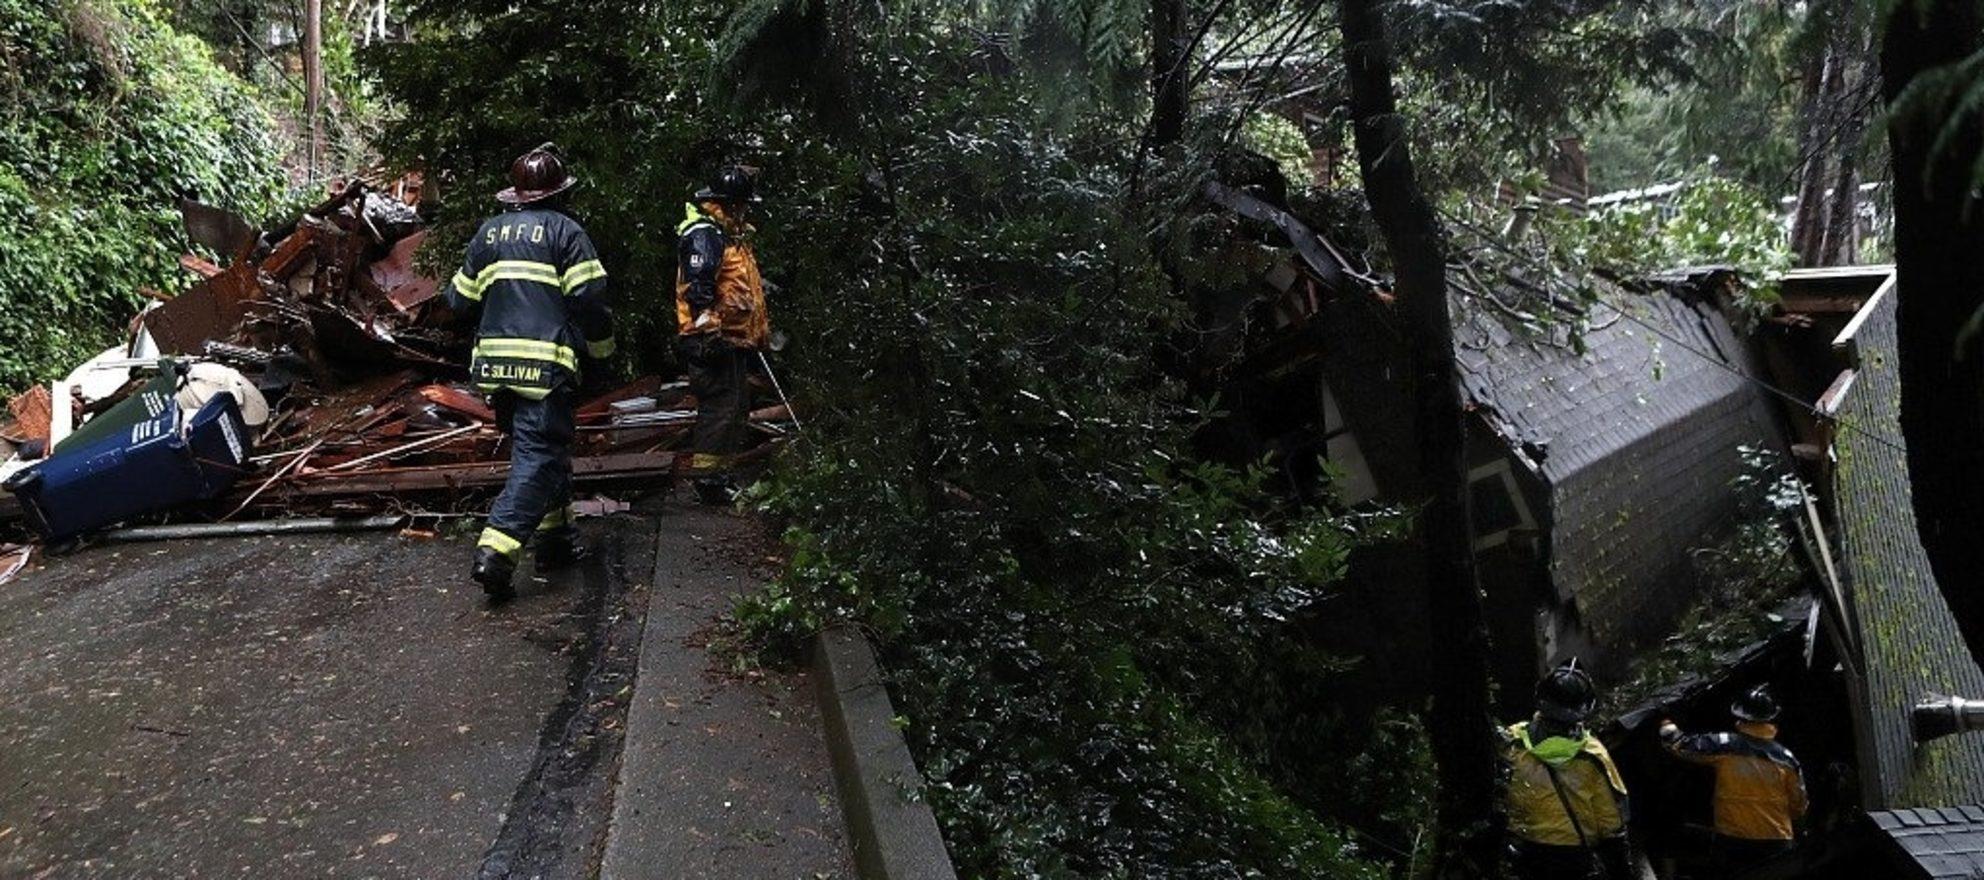 Major mudslide in California prompts evacuations